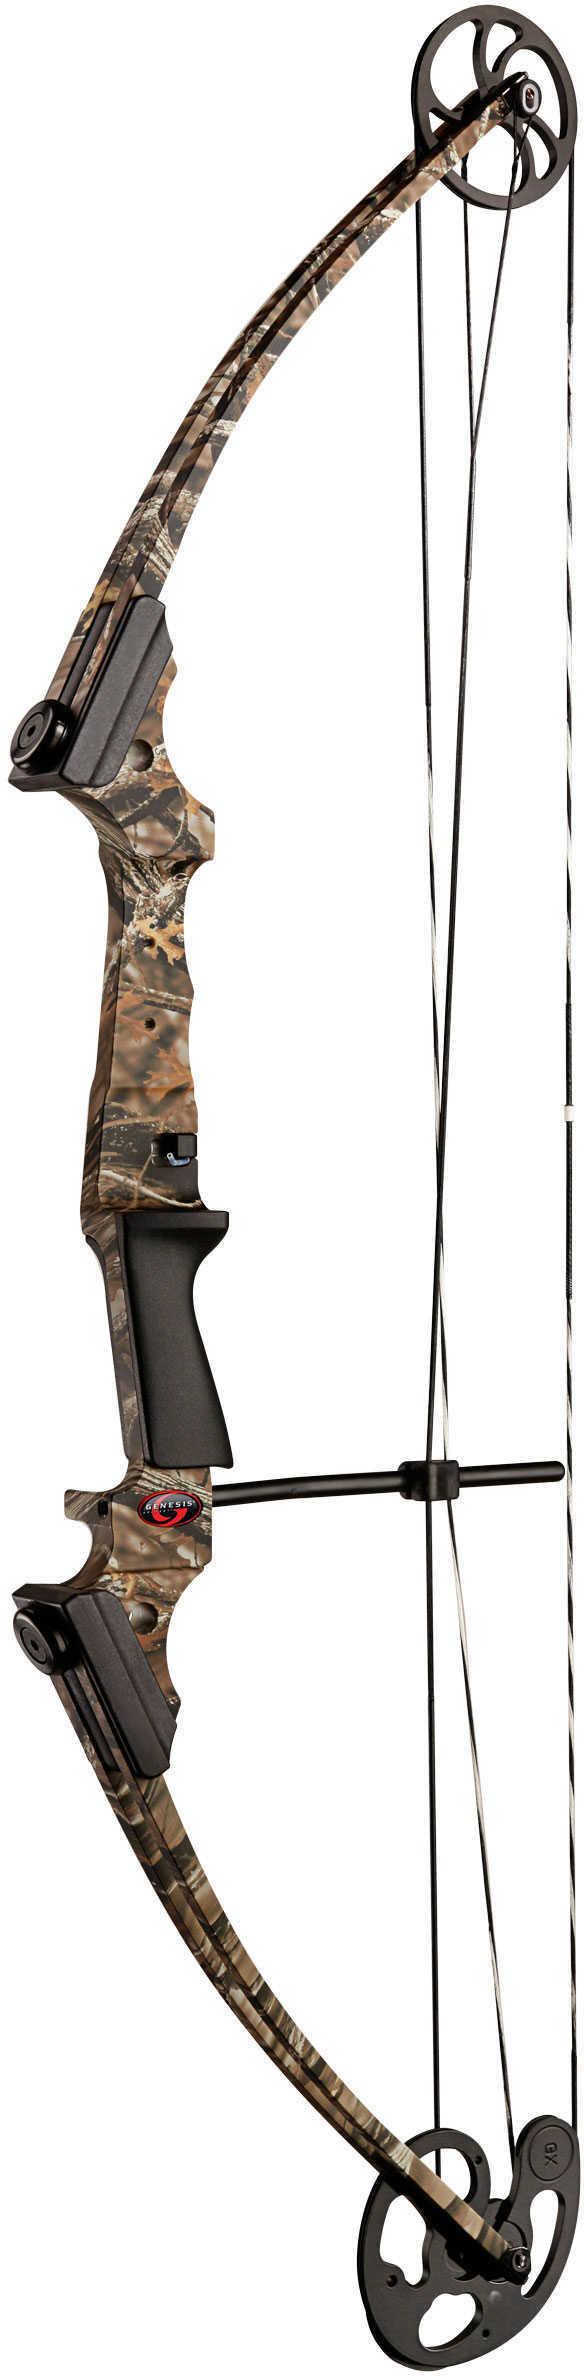 Genesis Bow Set Lost RH Model: 12242